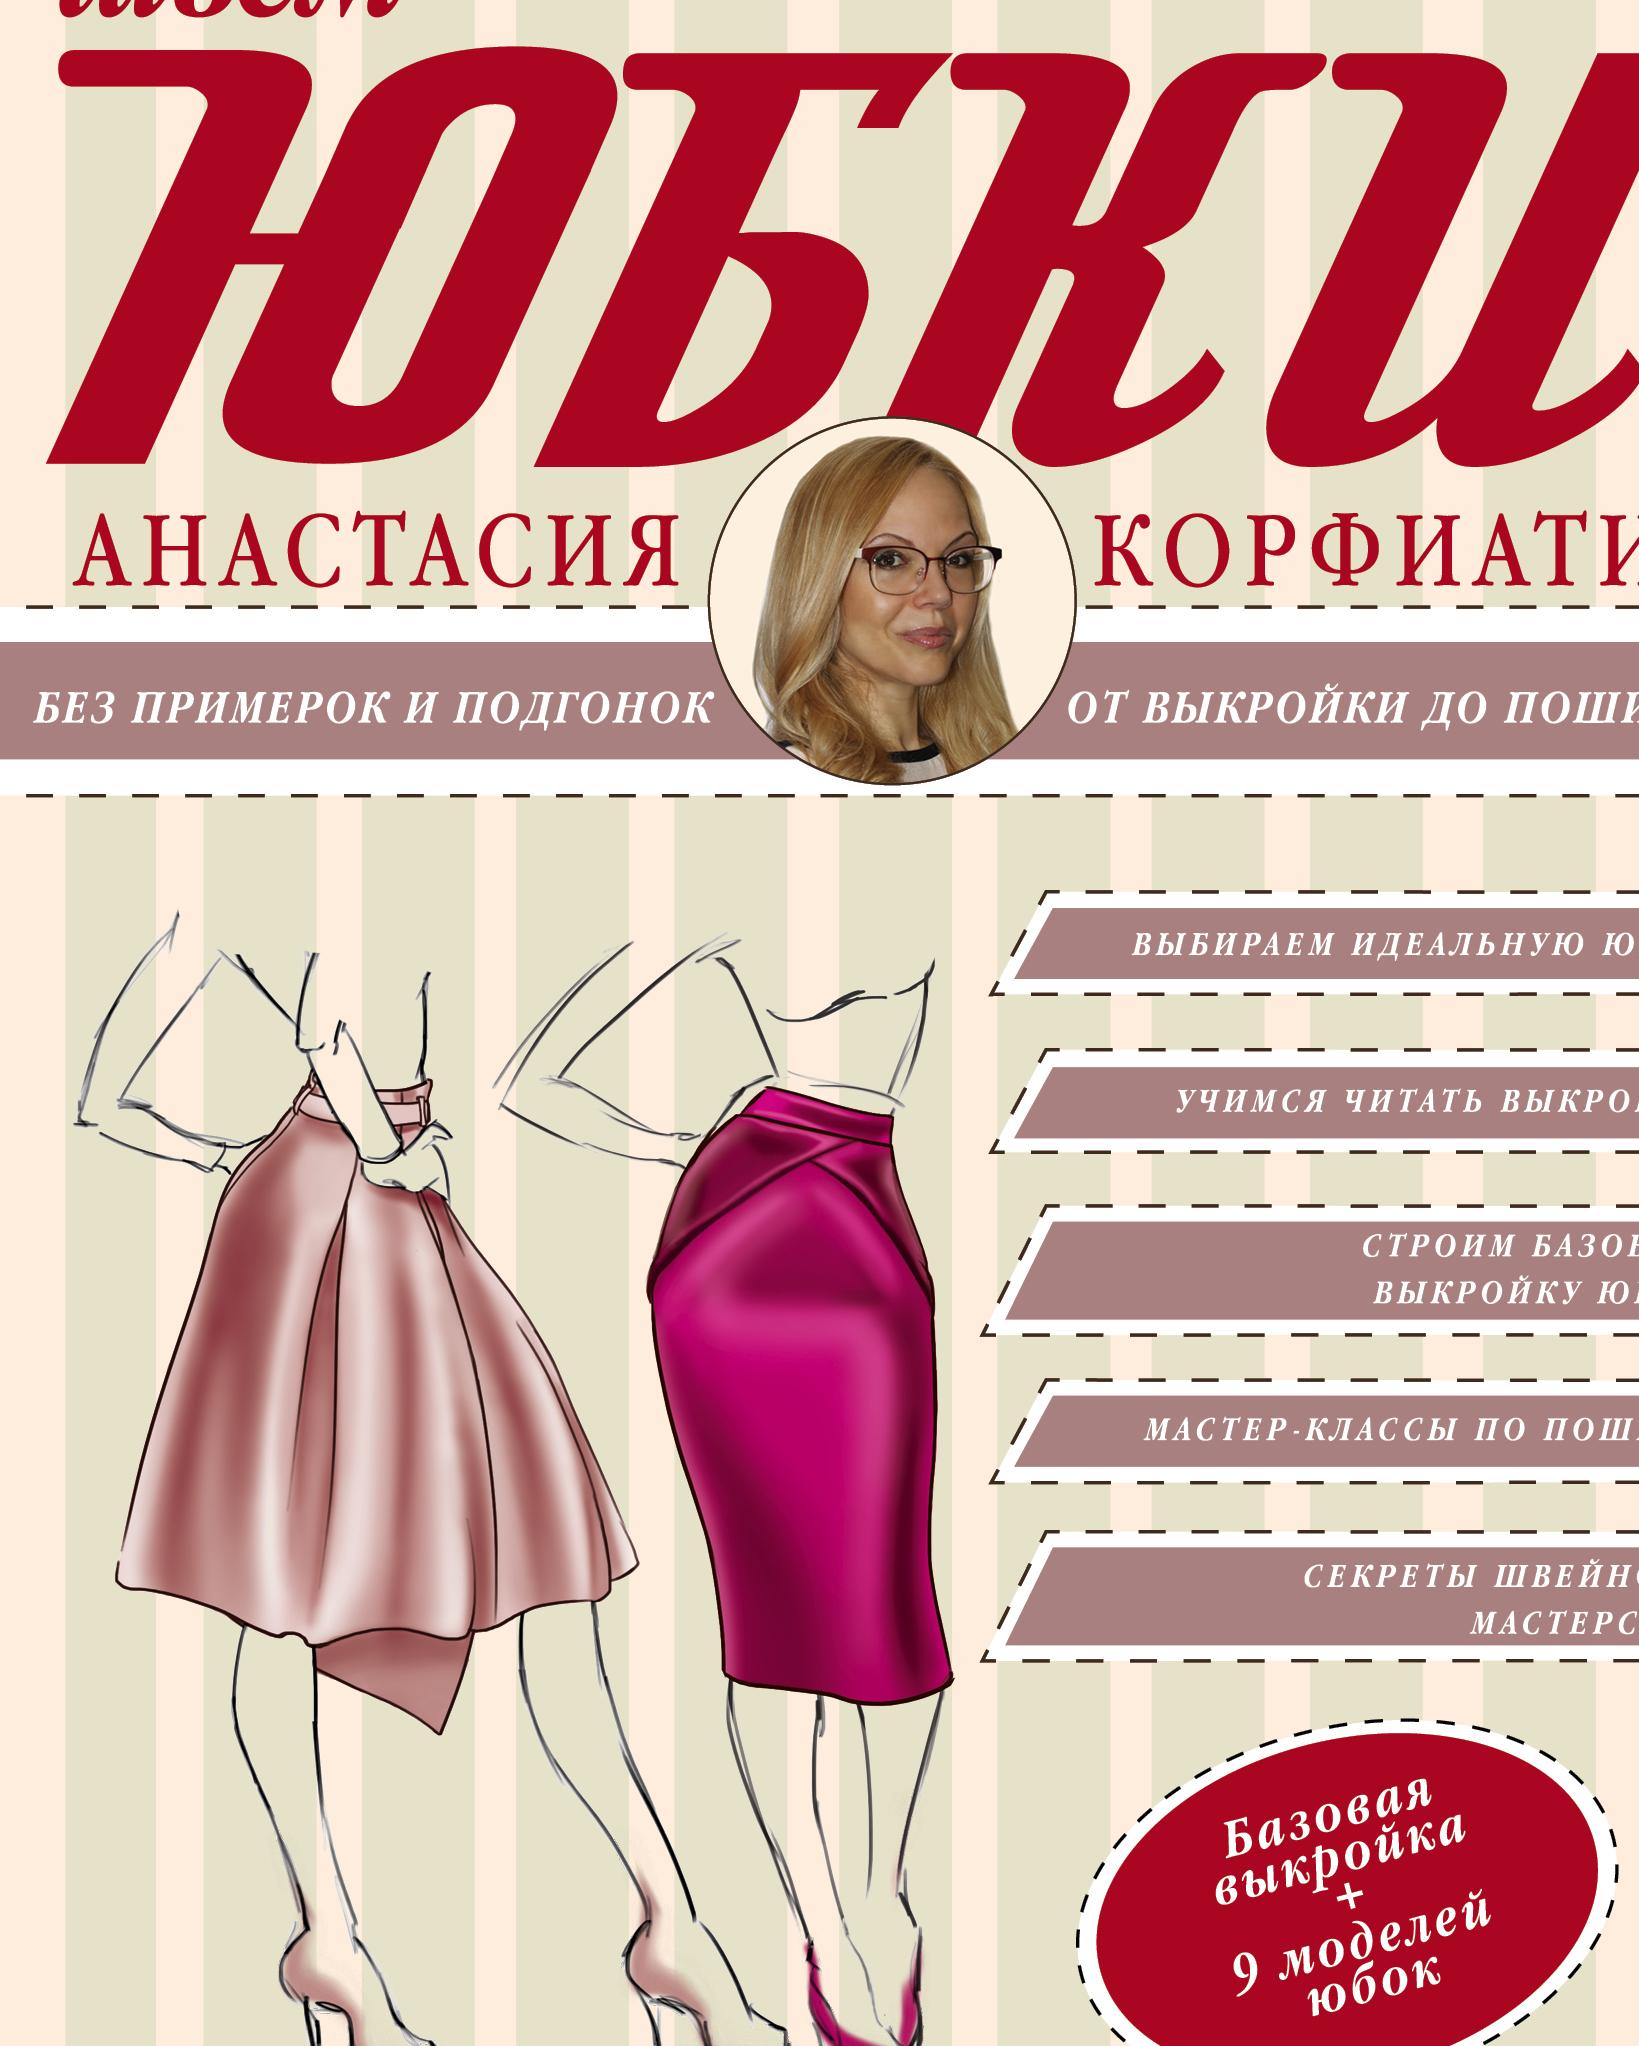 Шьем юбки без примерок и подгонок ( Корфиати А.  )